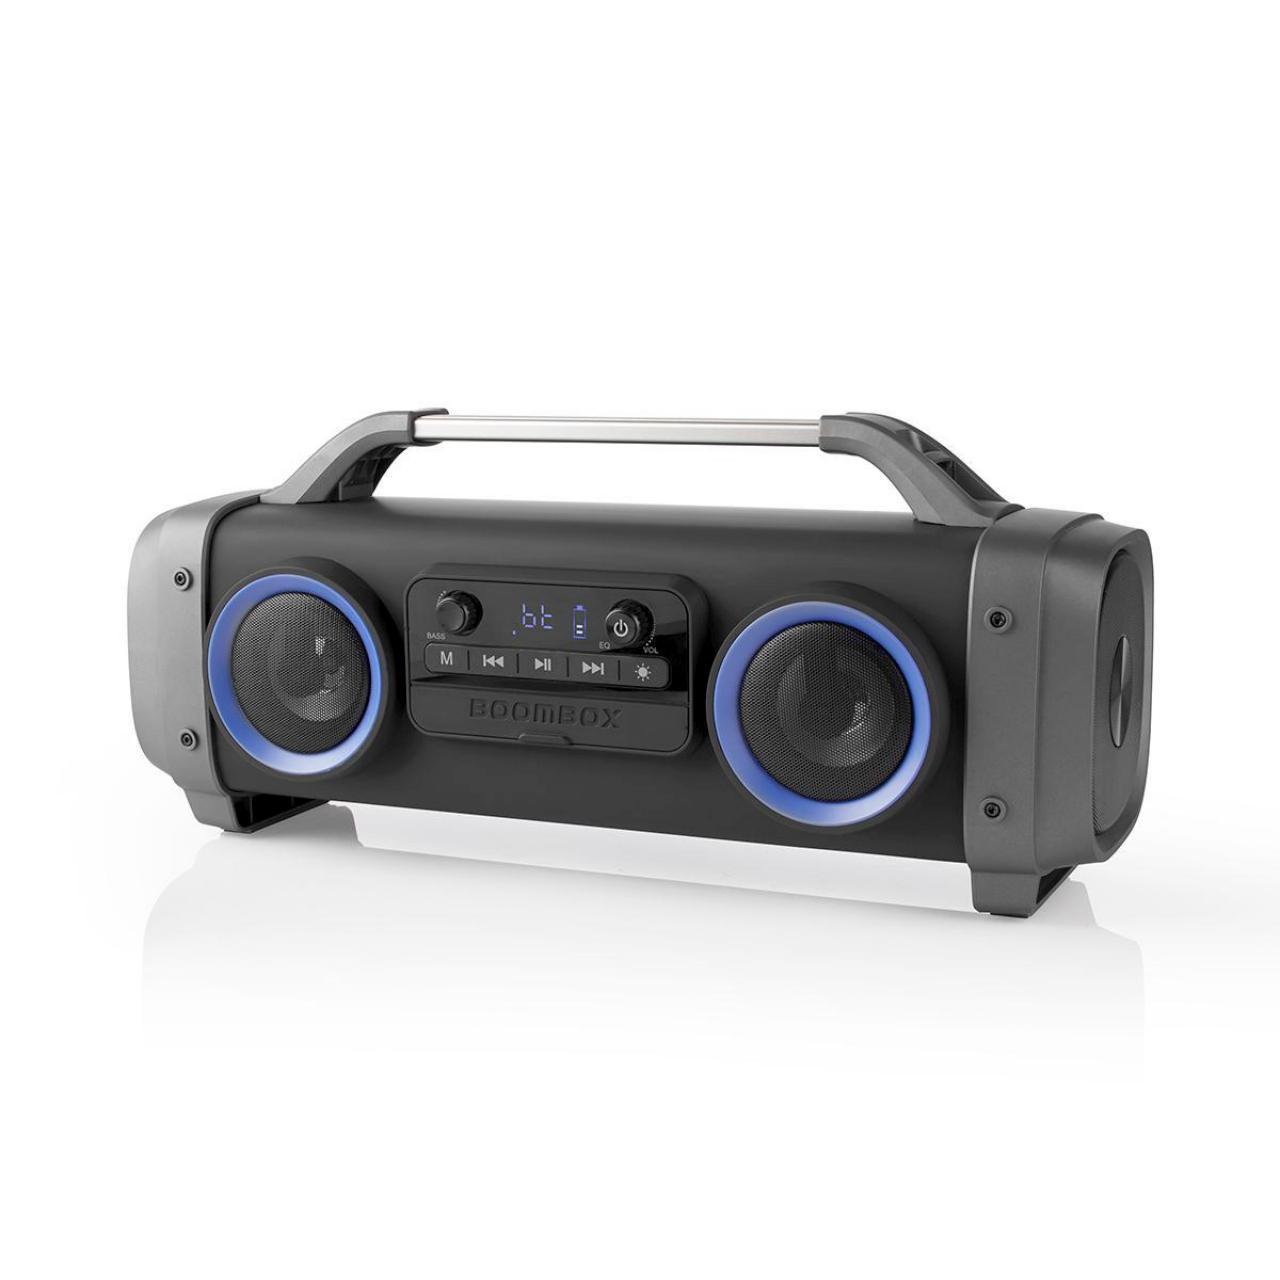 Oplaadbare boombox ghettoblaster met Bluetooth, verlichting, FM Radio, USB en MicroSD